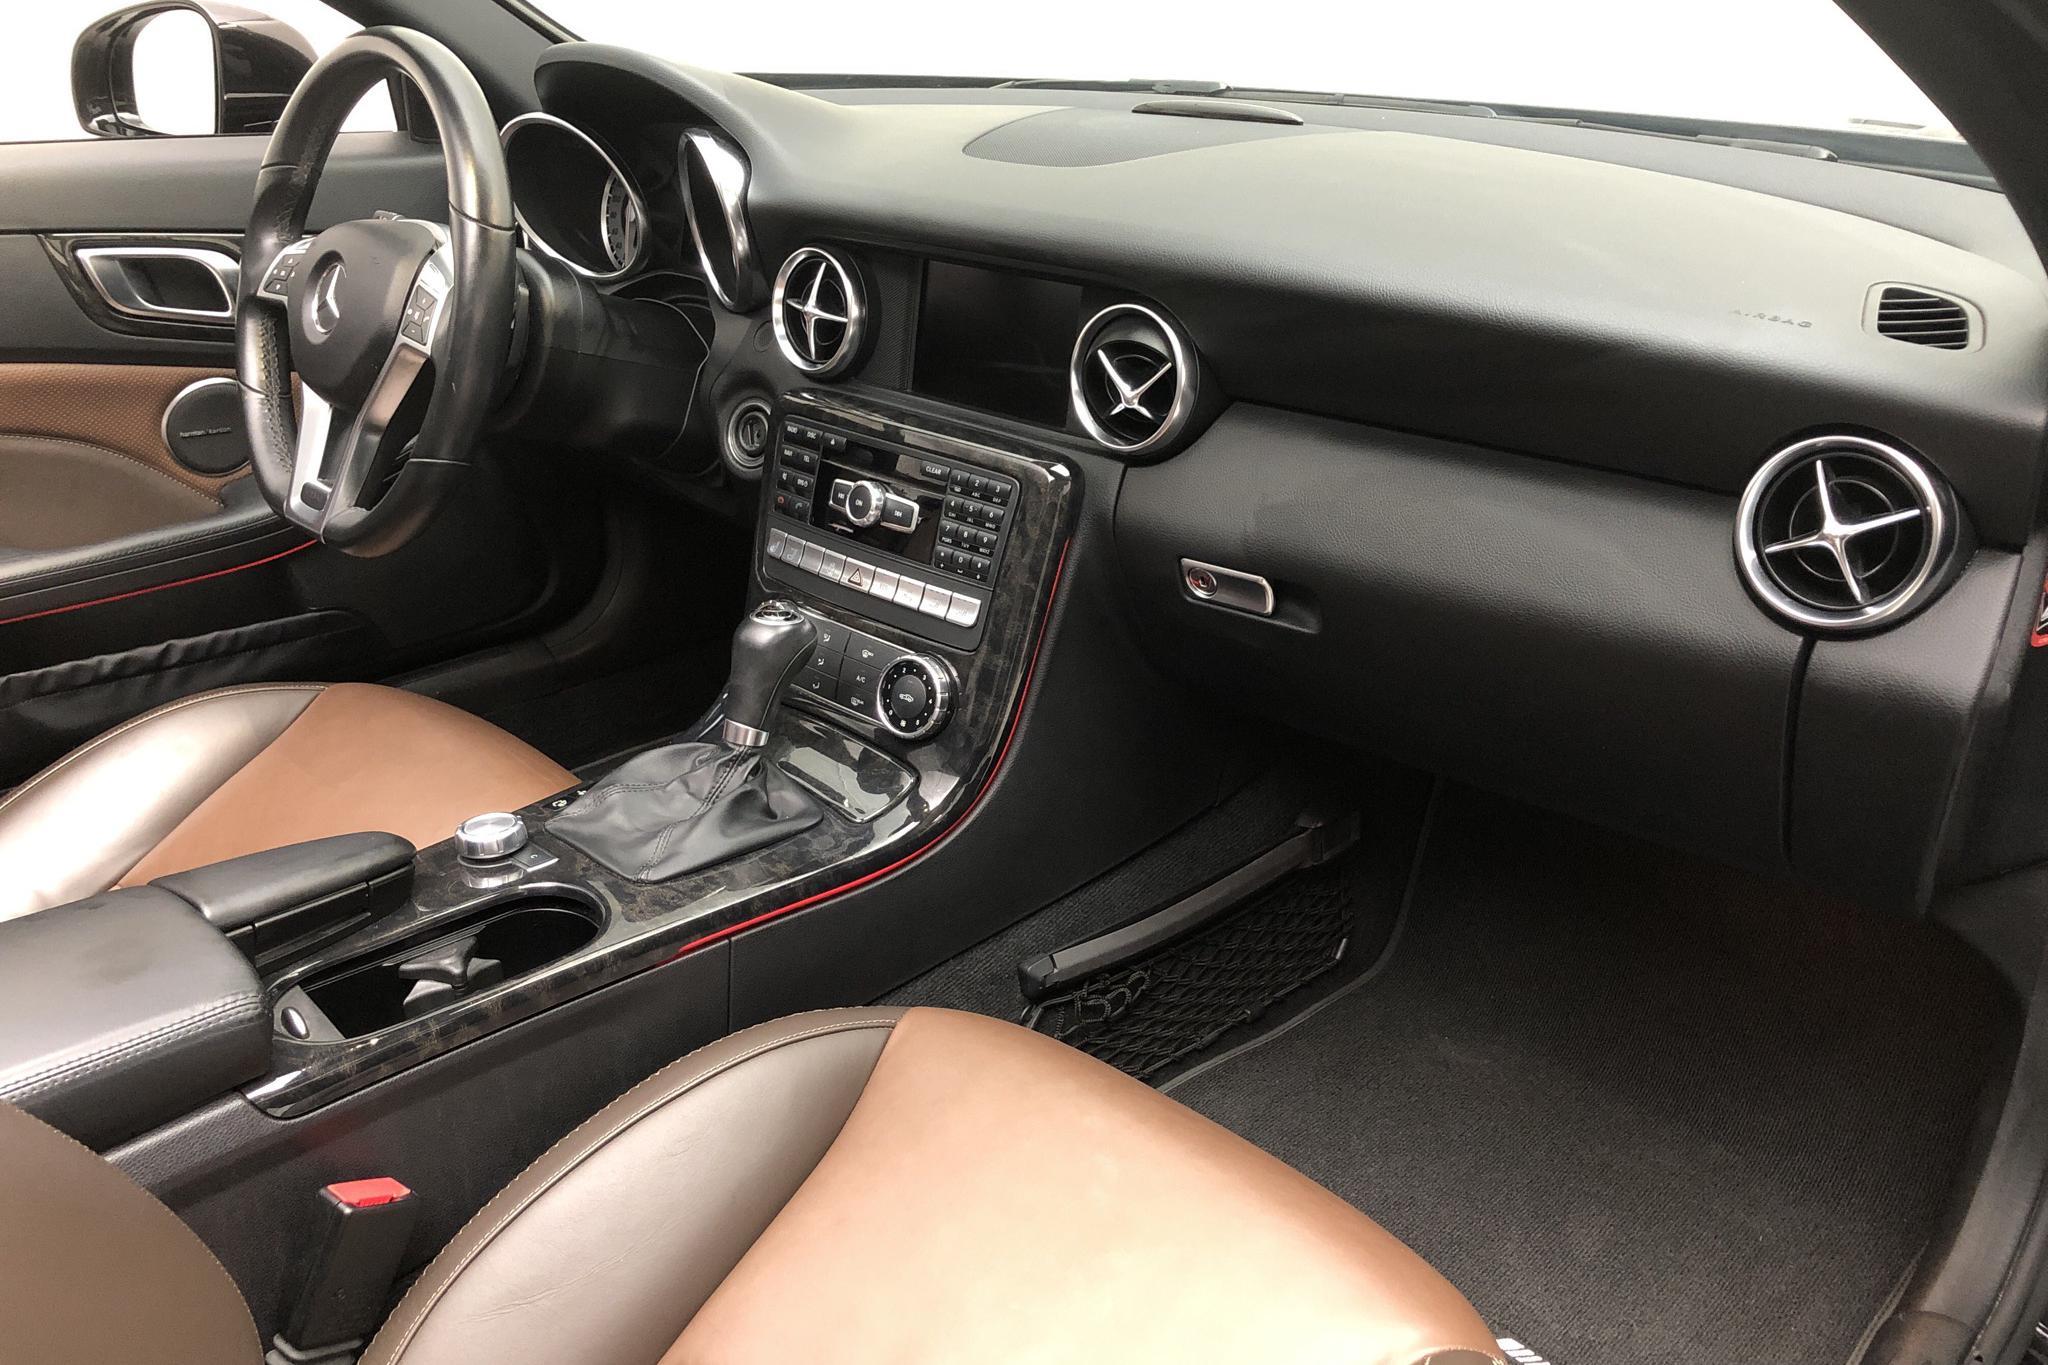 Mercedes SLK 350 V6 R172 (306hk) - 63 810 km - Automatic - black - 2012